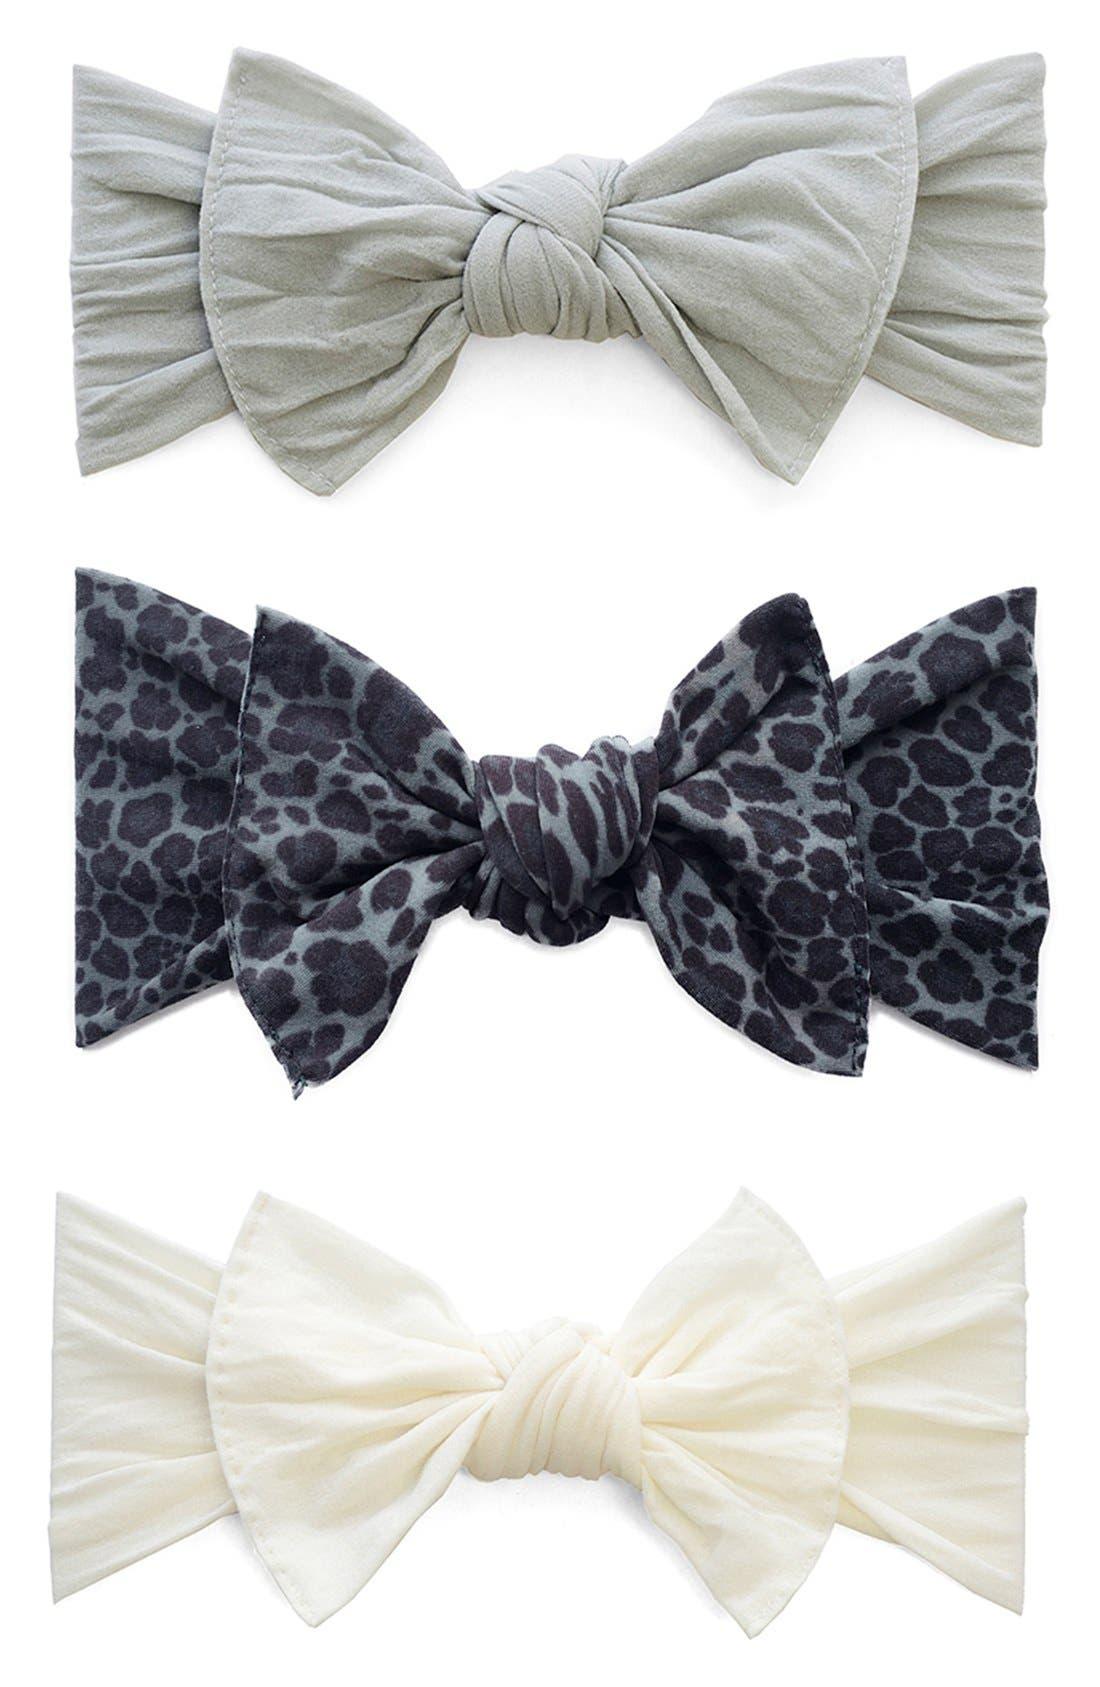 Main Image - Baby Bling Bow Stretch Headband (3-Pack) (Baby Girls)